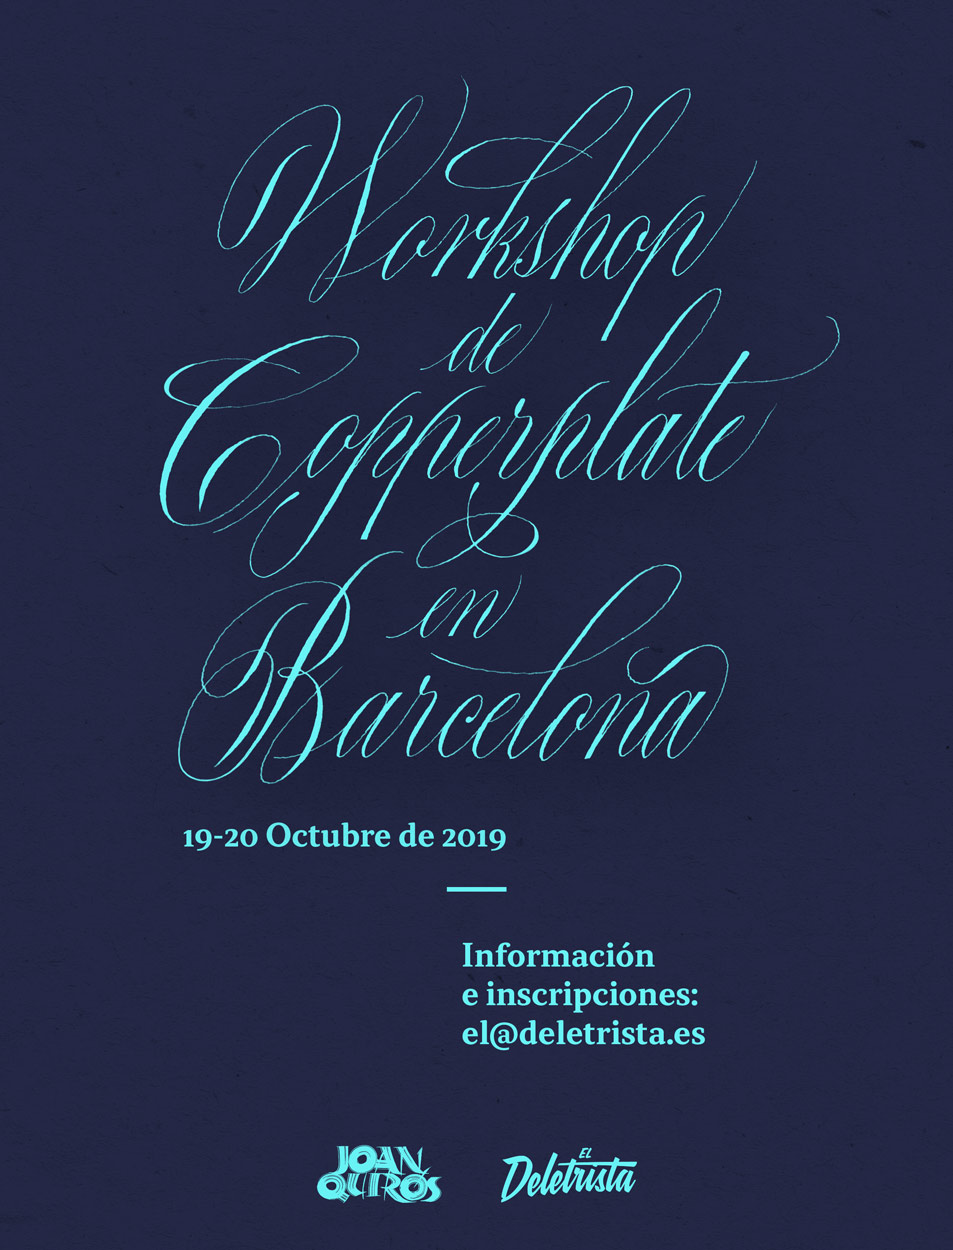 Copperplate-Workshop-Barcelona-Joan-Quiros.jpg